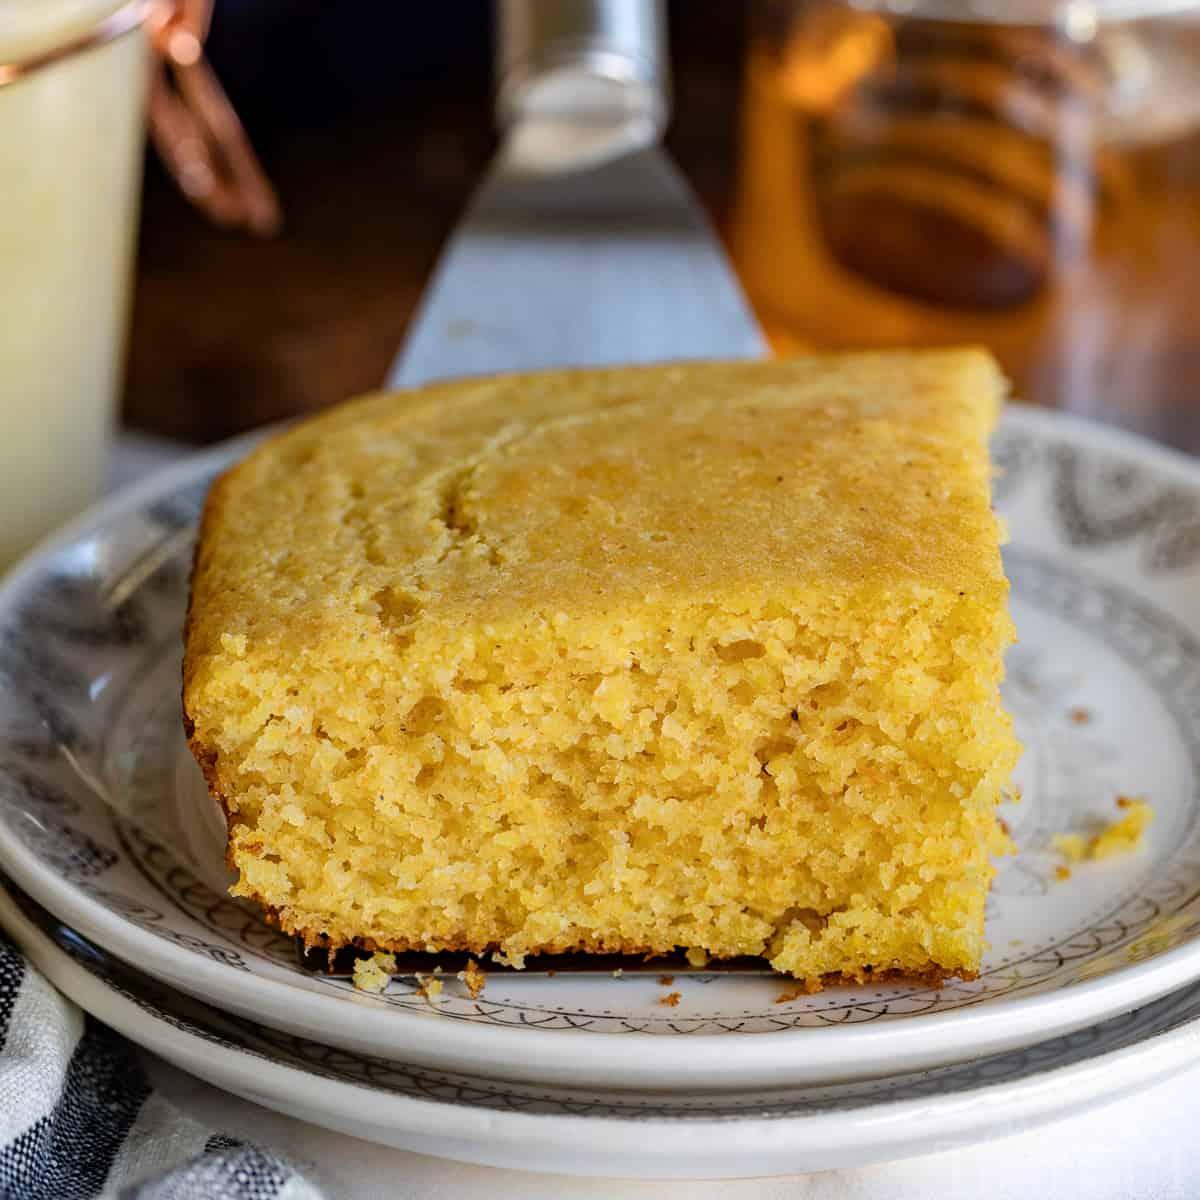 piece of cornbread on plate